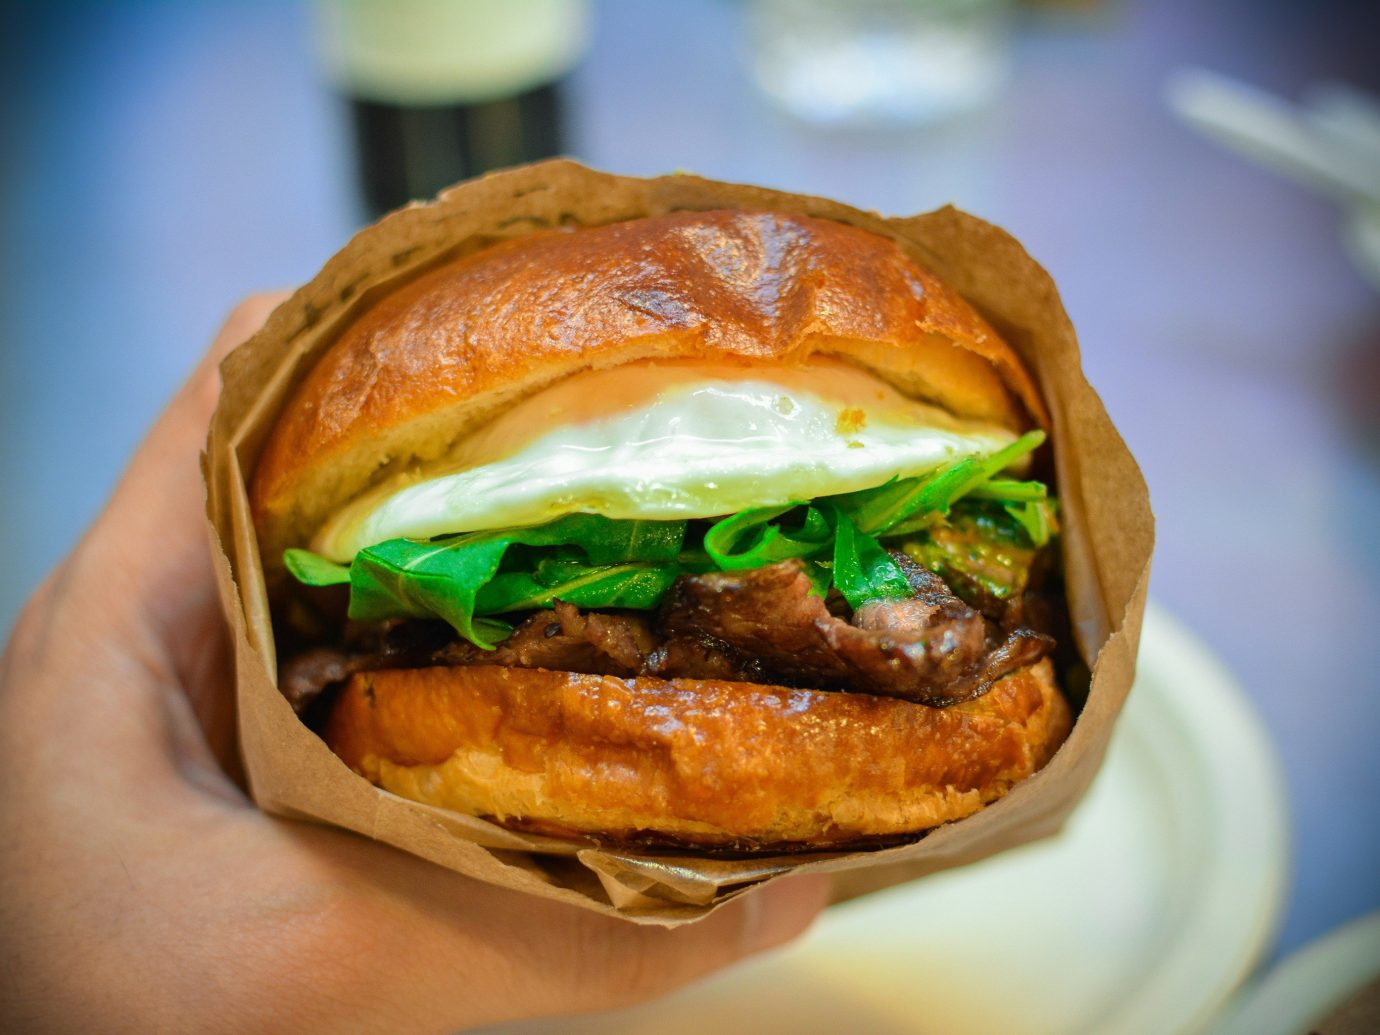 Food + Drink food hamburger person dish indoor snack food cheeseburger veggie burger sandwich bánh mì meal breakfast sandwich slider meat fast food cheesesteak breakfast close